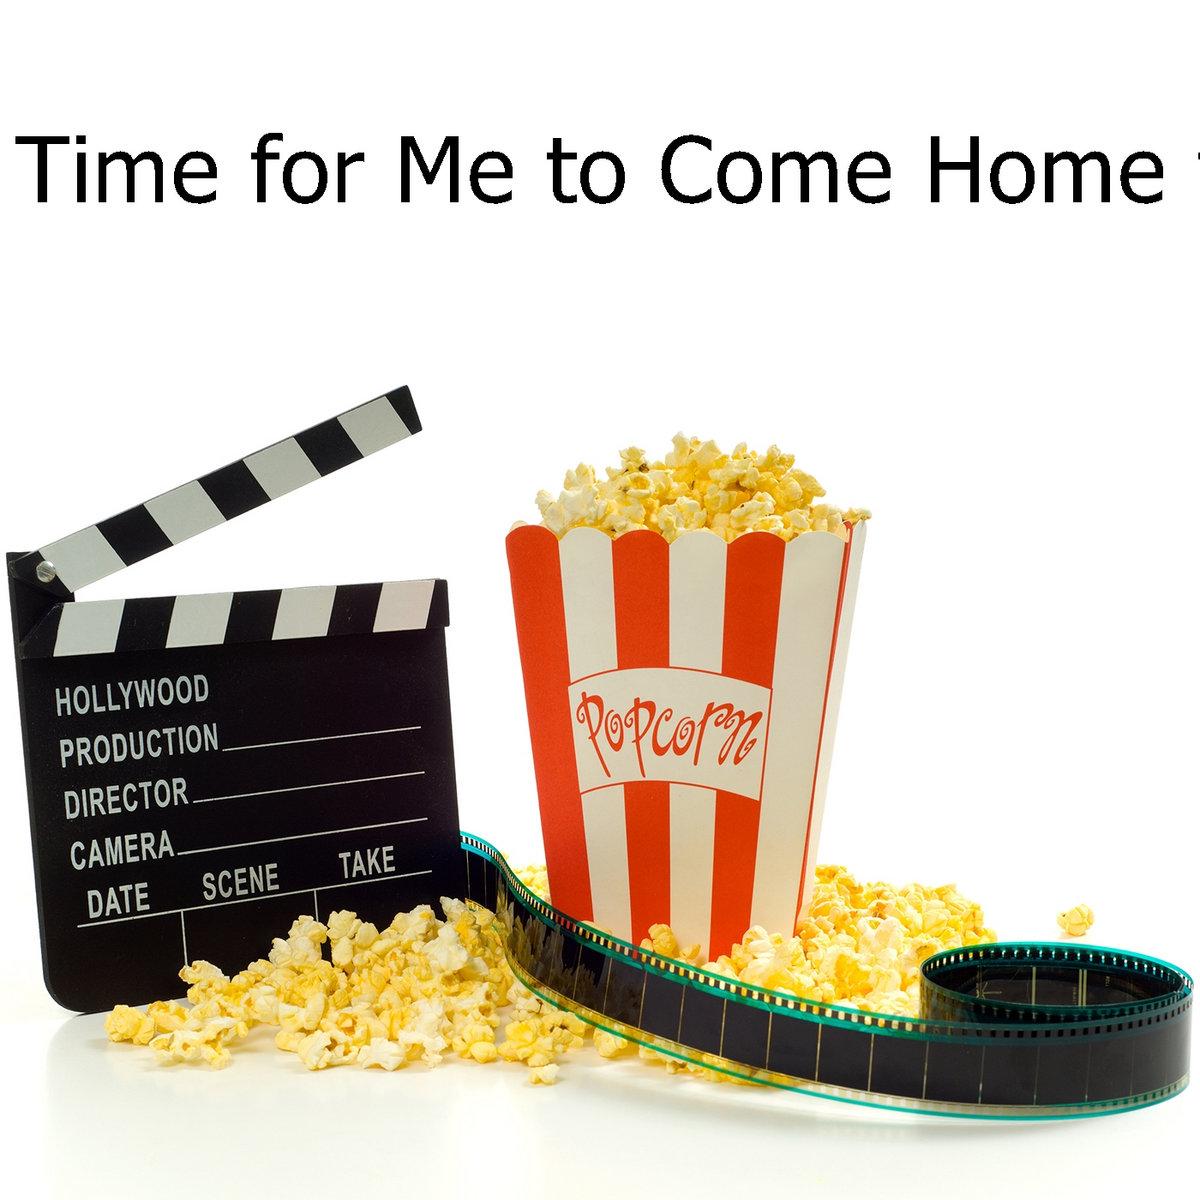 Time For Me To Come Home For Christmas.Theatrical Full Time For Me To Come Home For Christmas